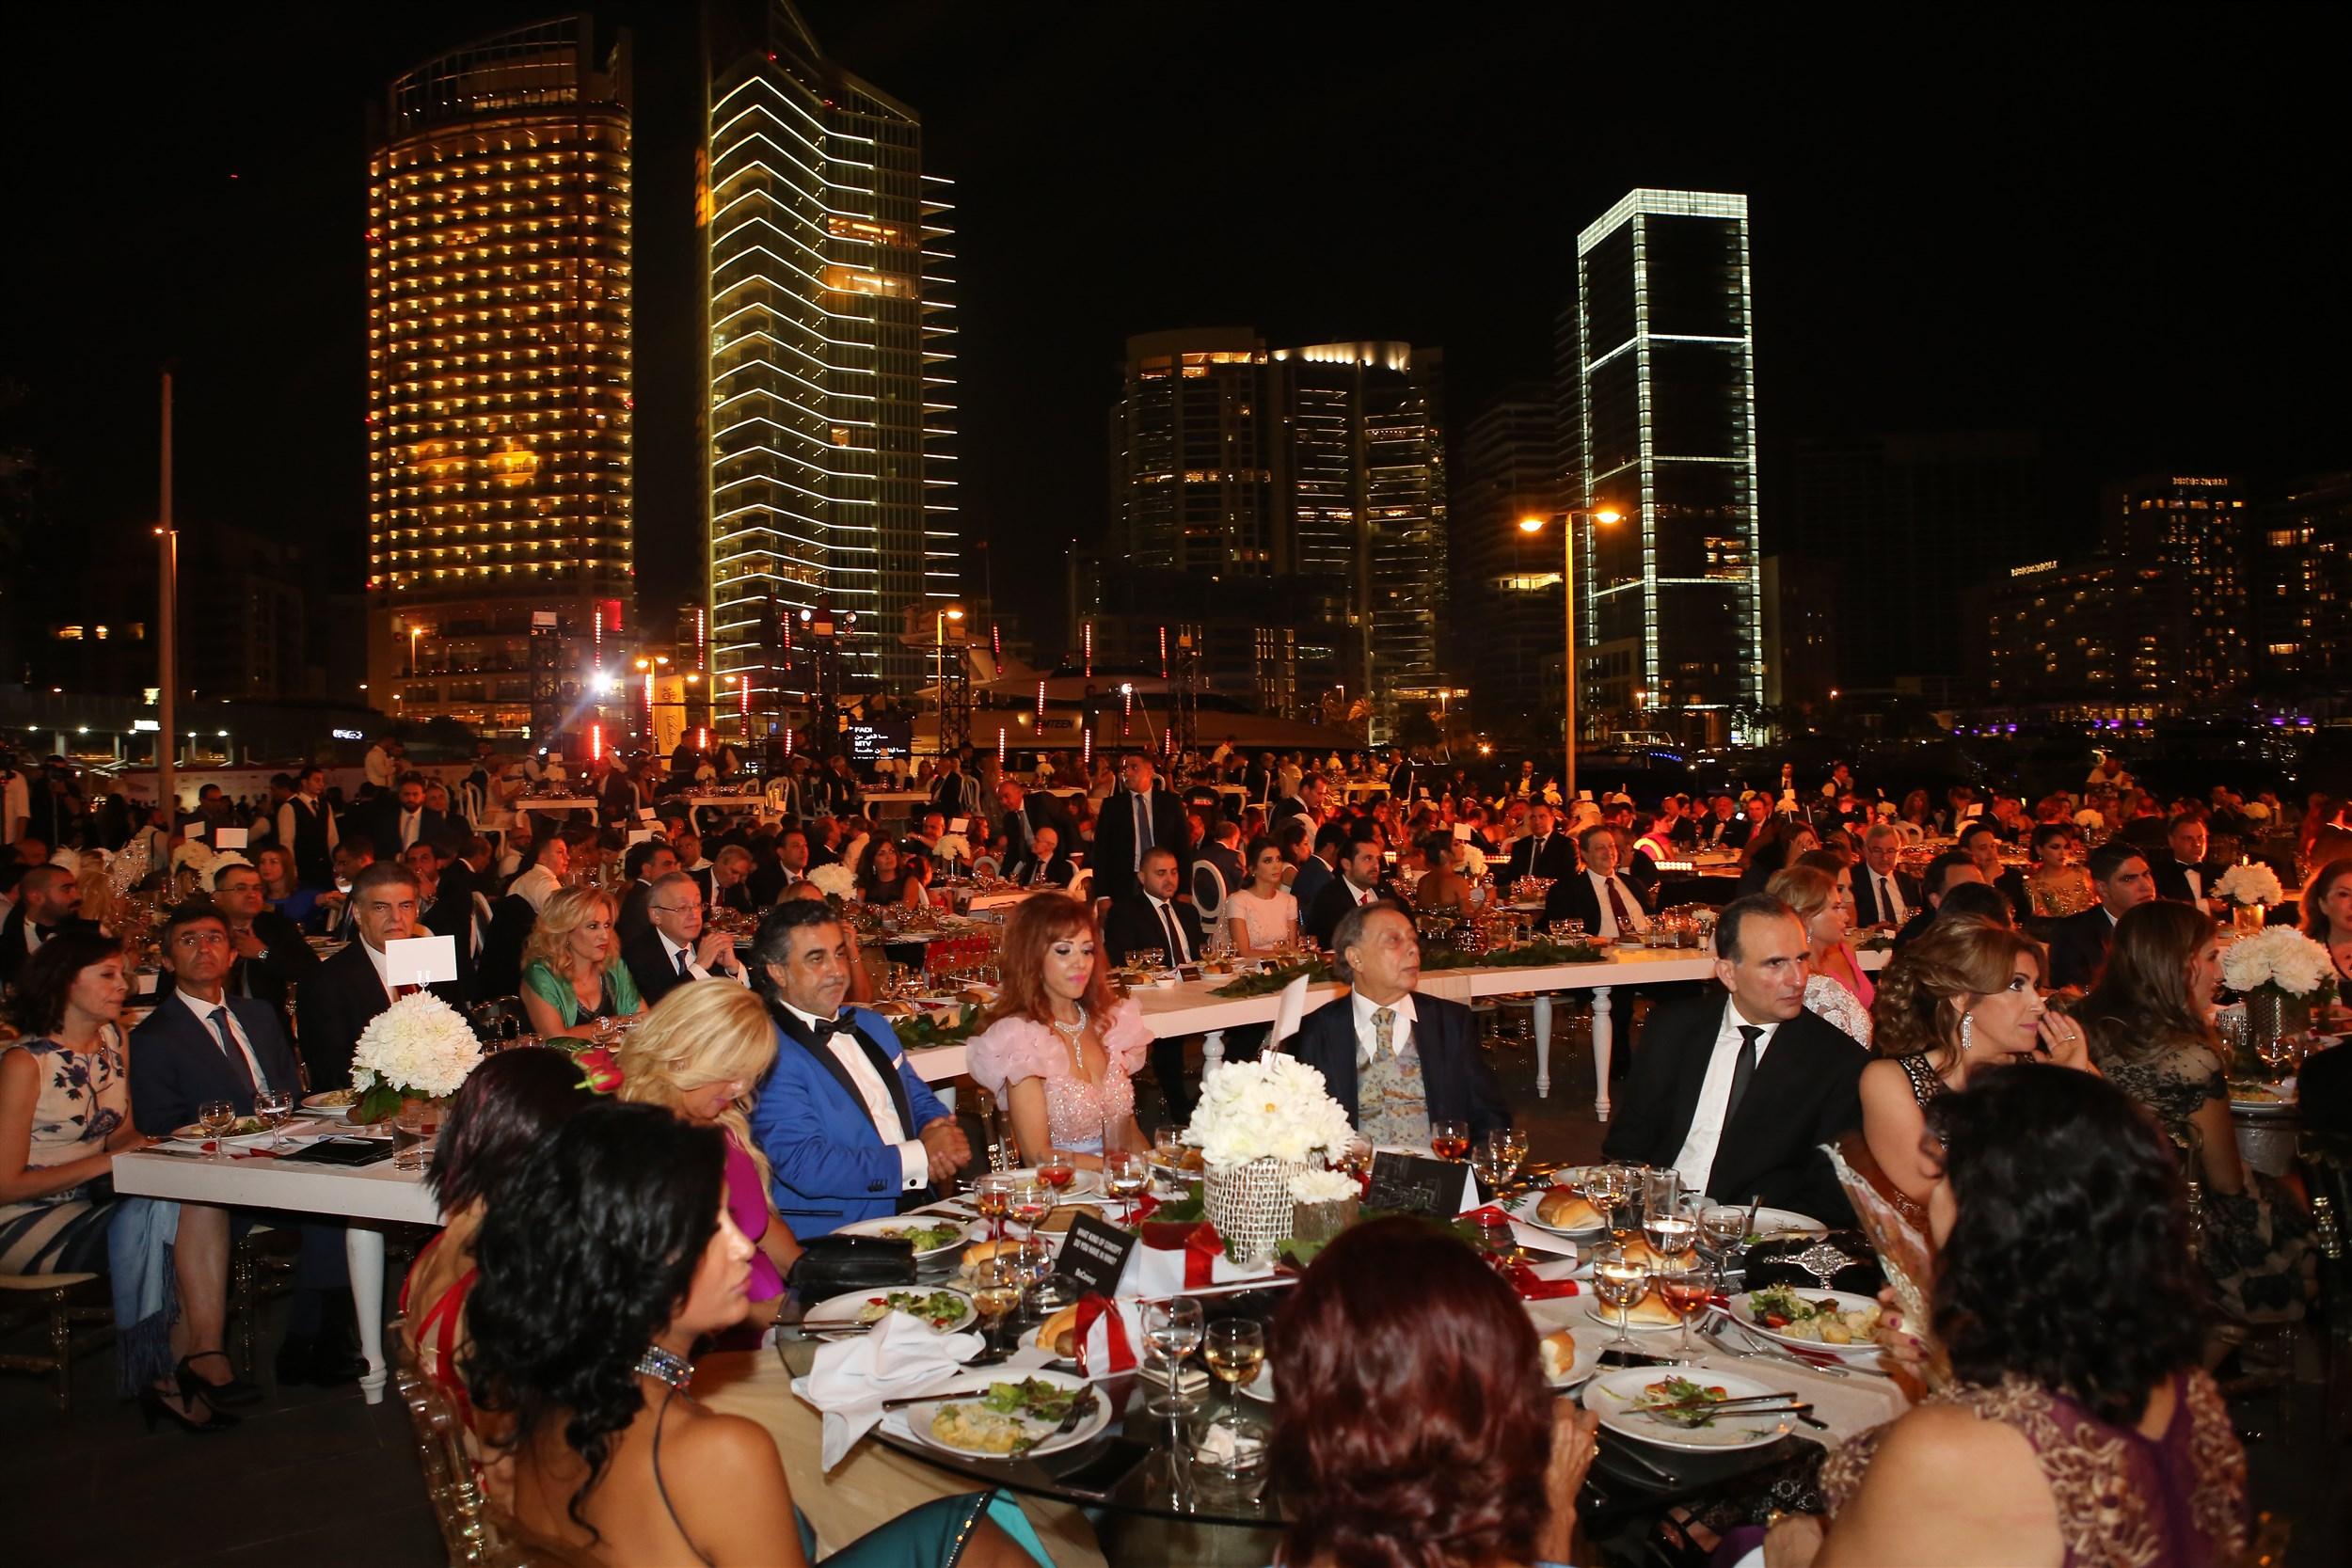 a warm view of the setup in beirut international award festival (biaf)